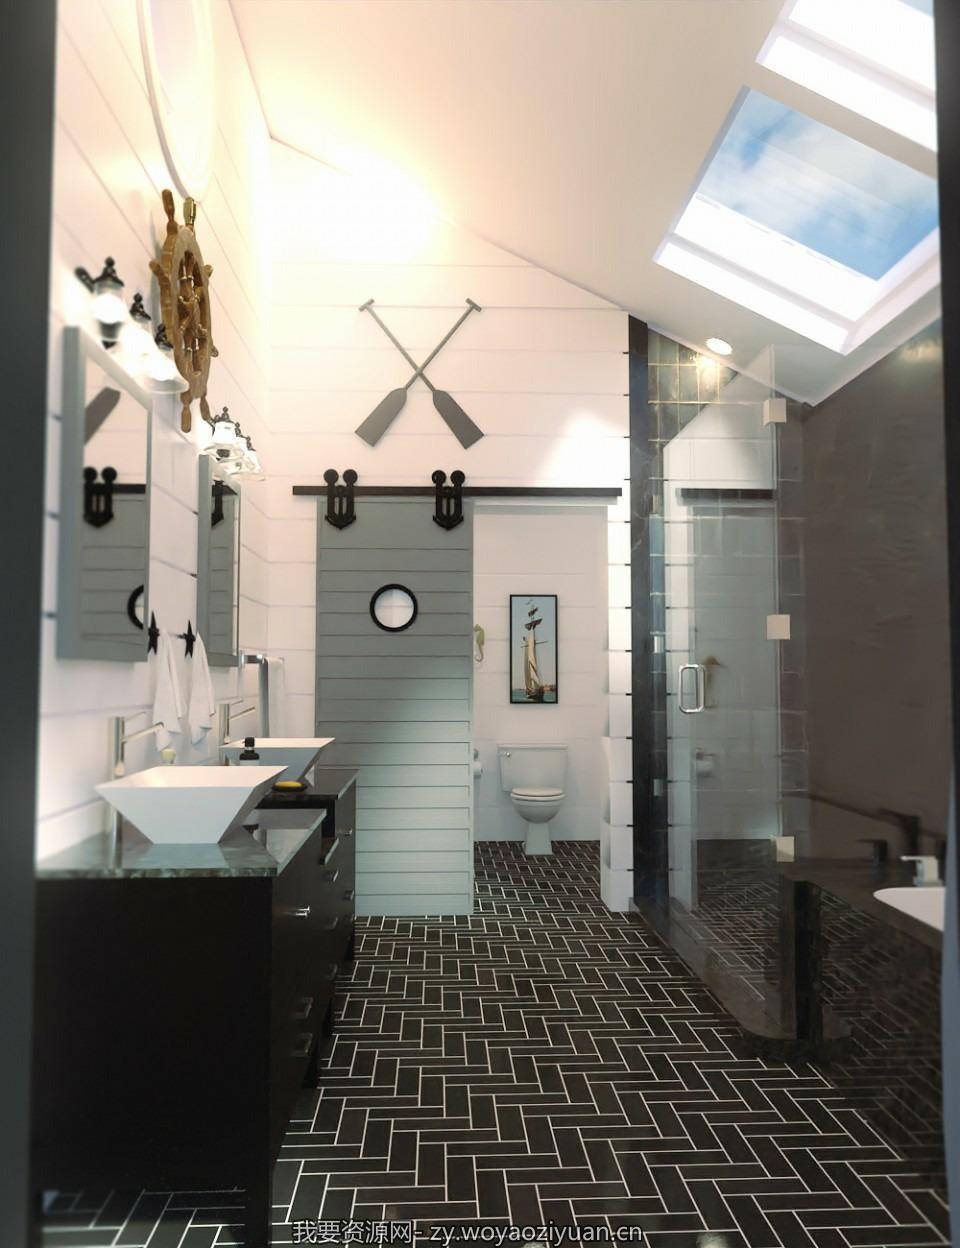 Regatta Bathroom